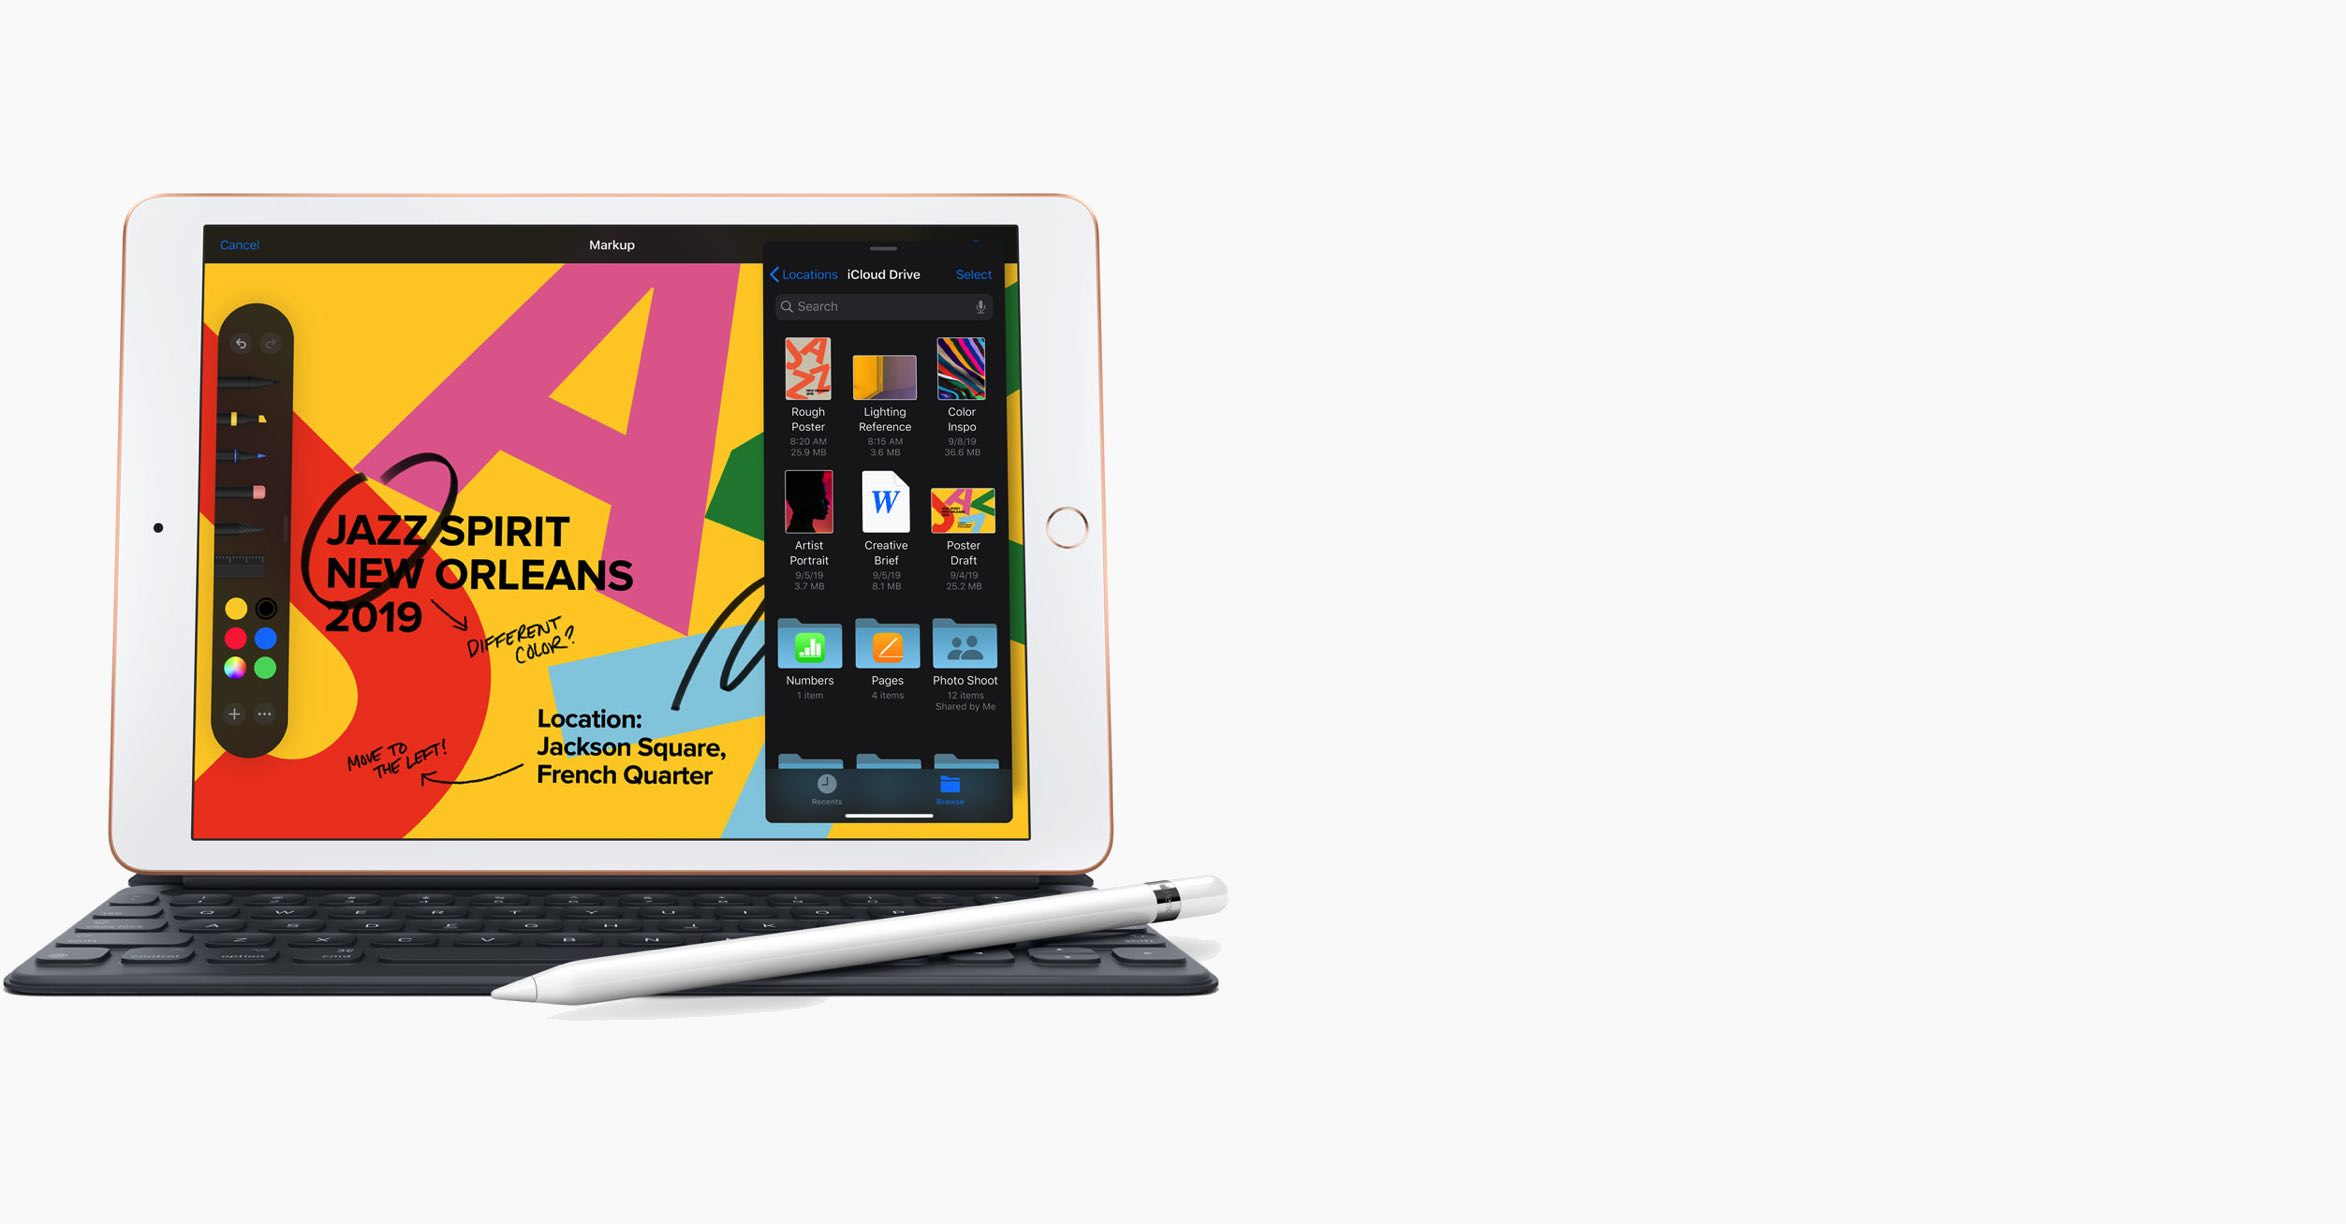 iPad Ninove